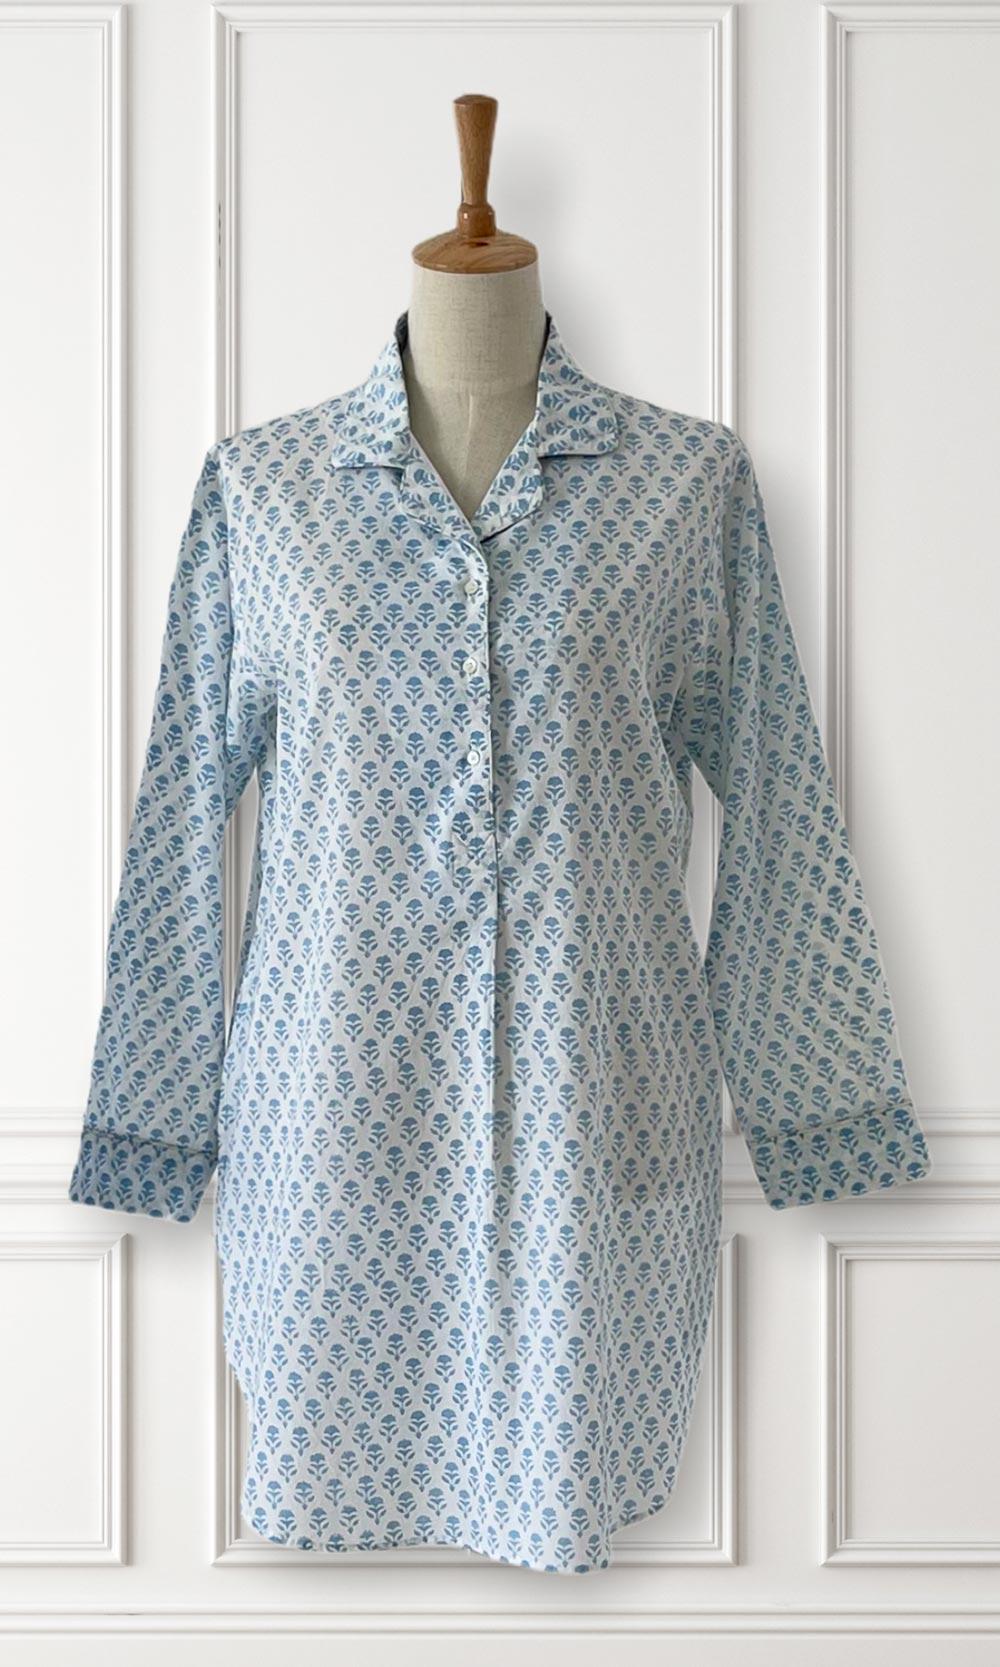 Hand Block Printed Indian Cotton Sleep Shirt